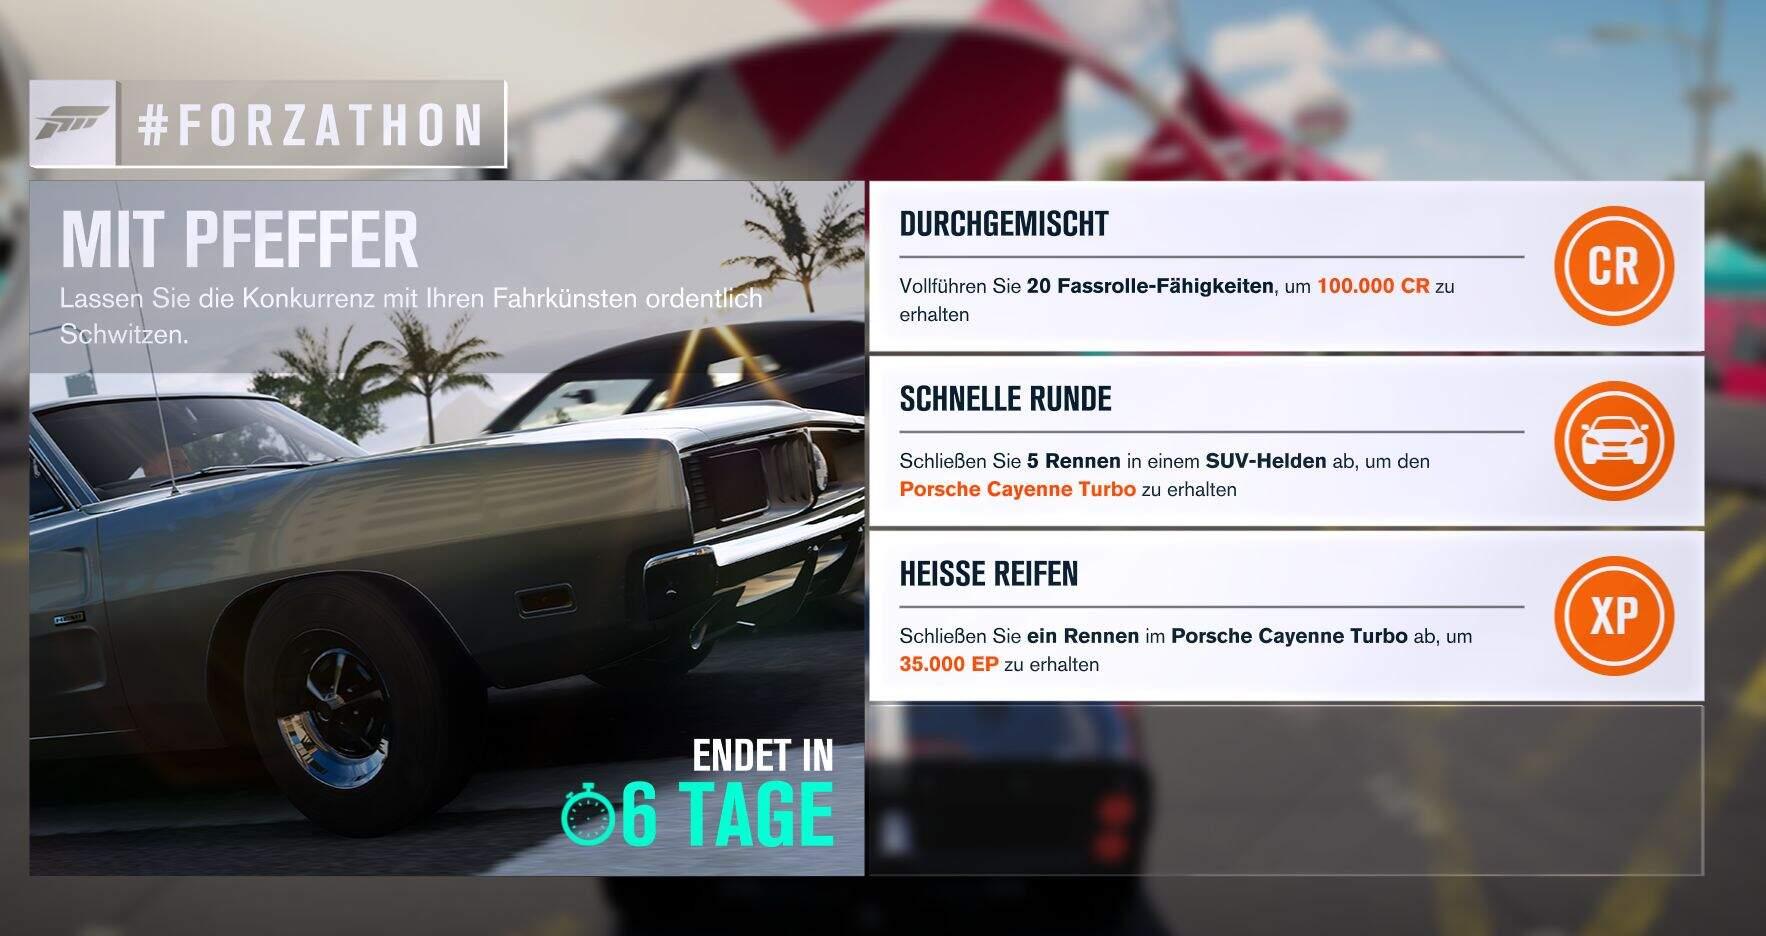 Forza Horizon 3 #Forzathon Guide KW 06 – Mit Pfeffer